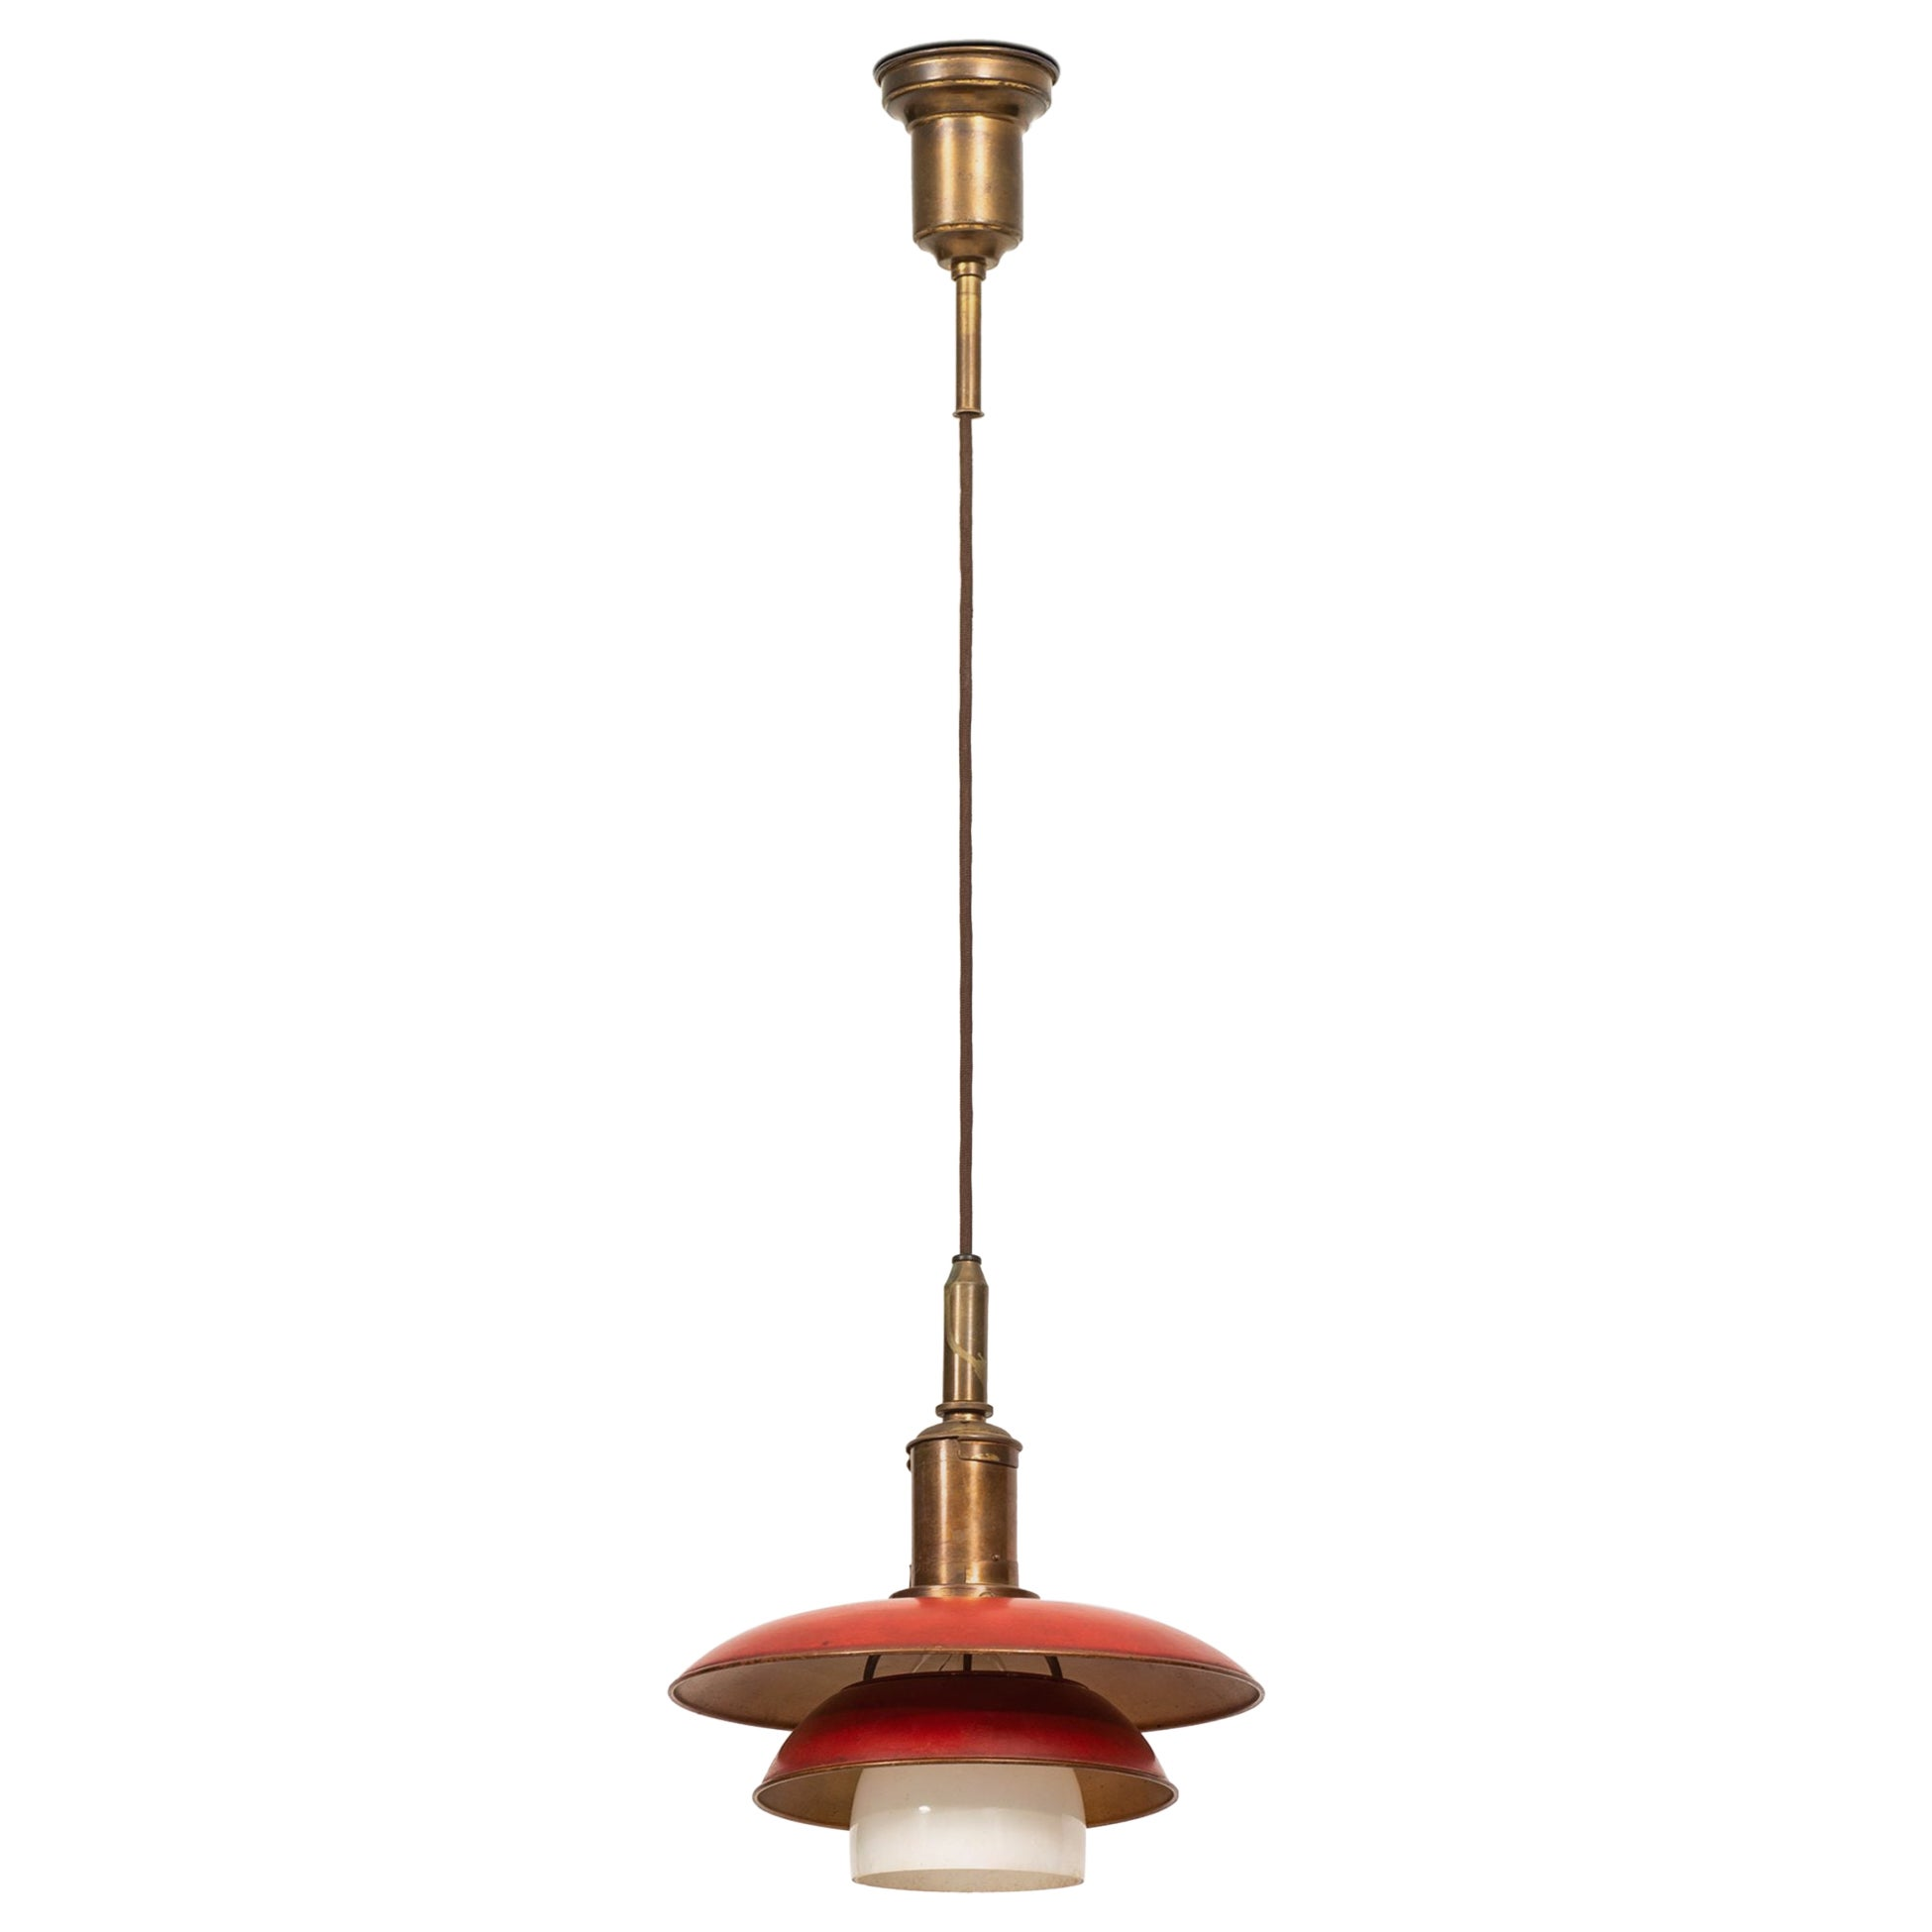 Poul Henningsen Ceiling Lamp Model PH-3/3 Produced by Louis Poulsen in Denmark